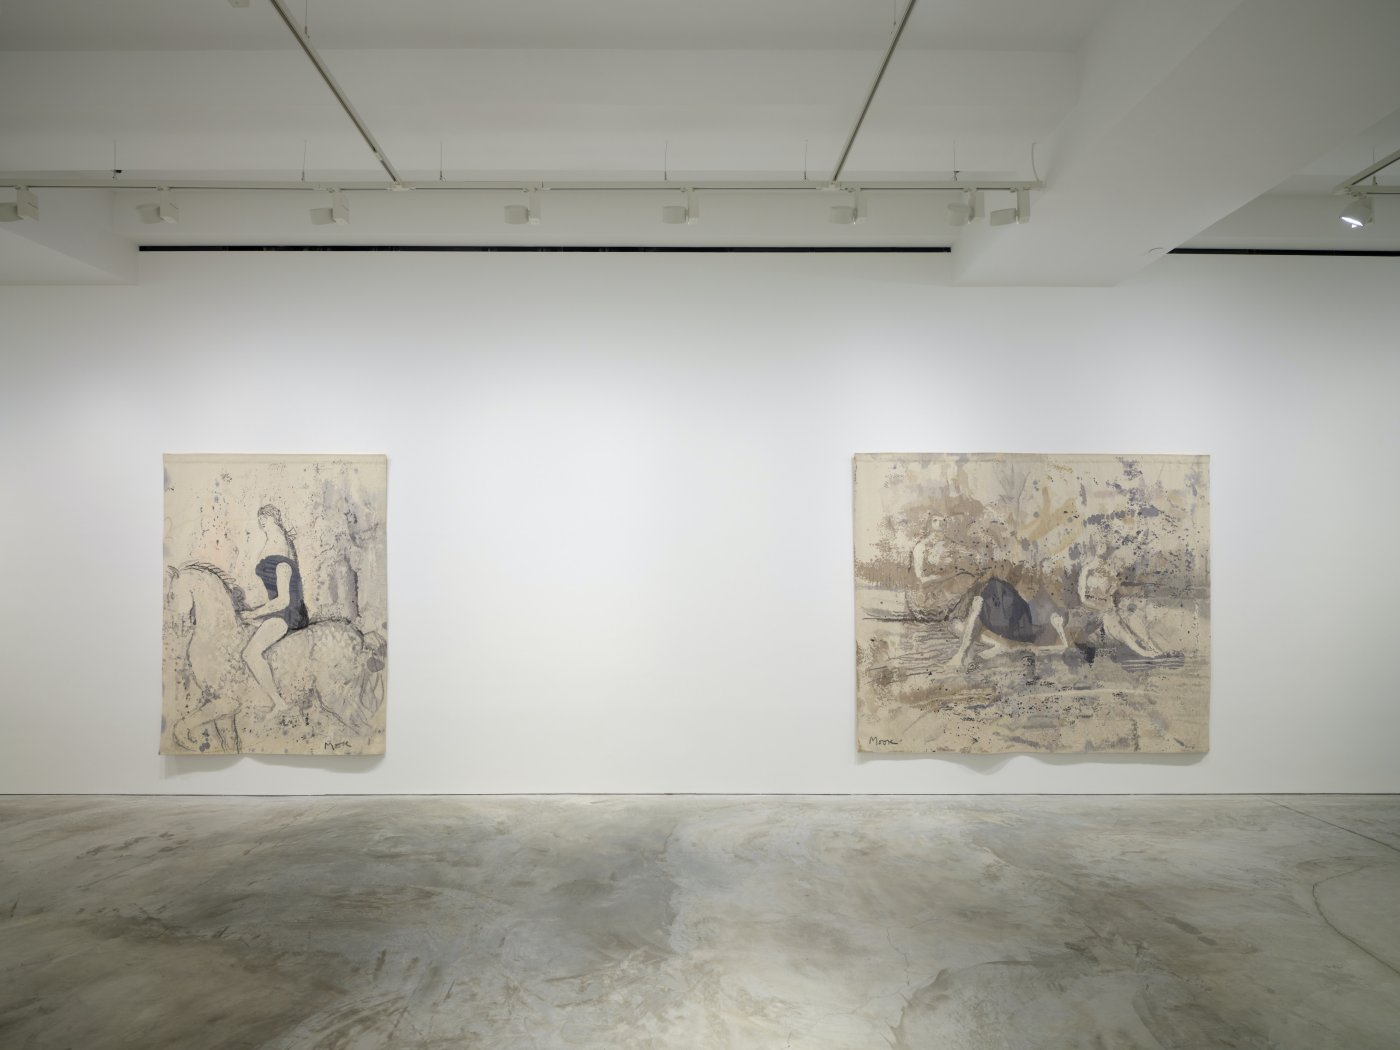 Hauser Wirth Hong Kong Henry Moore 2